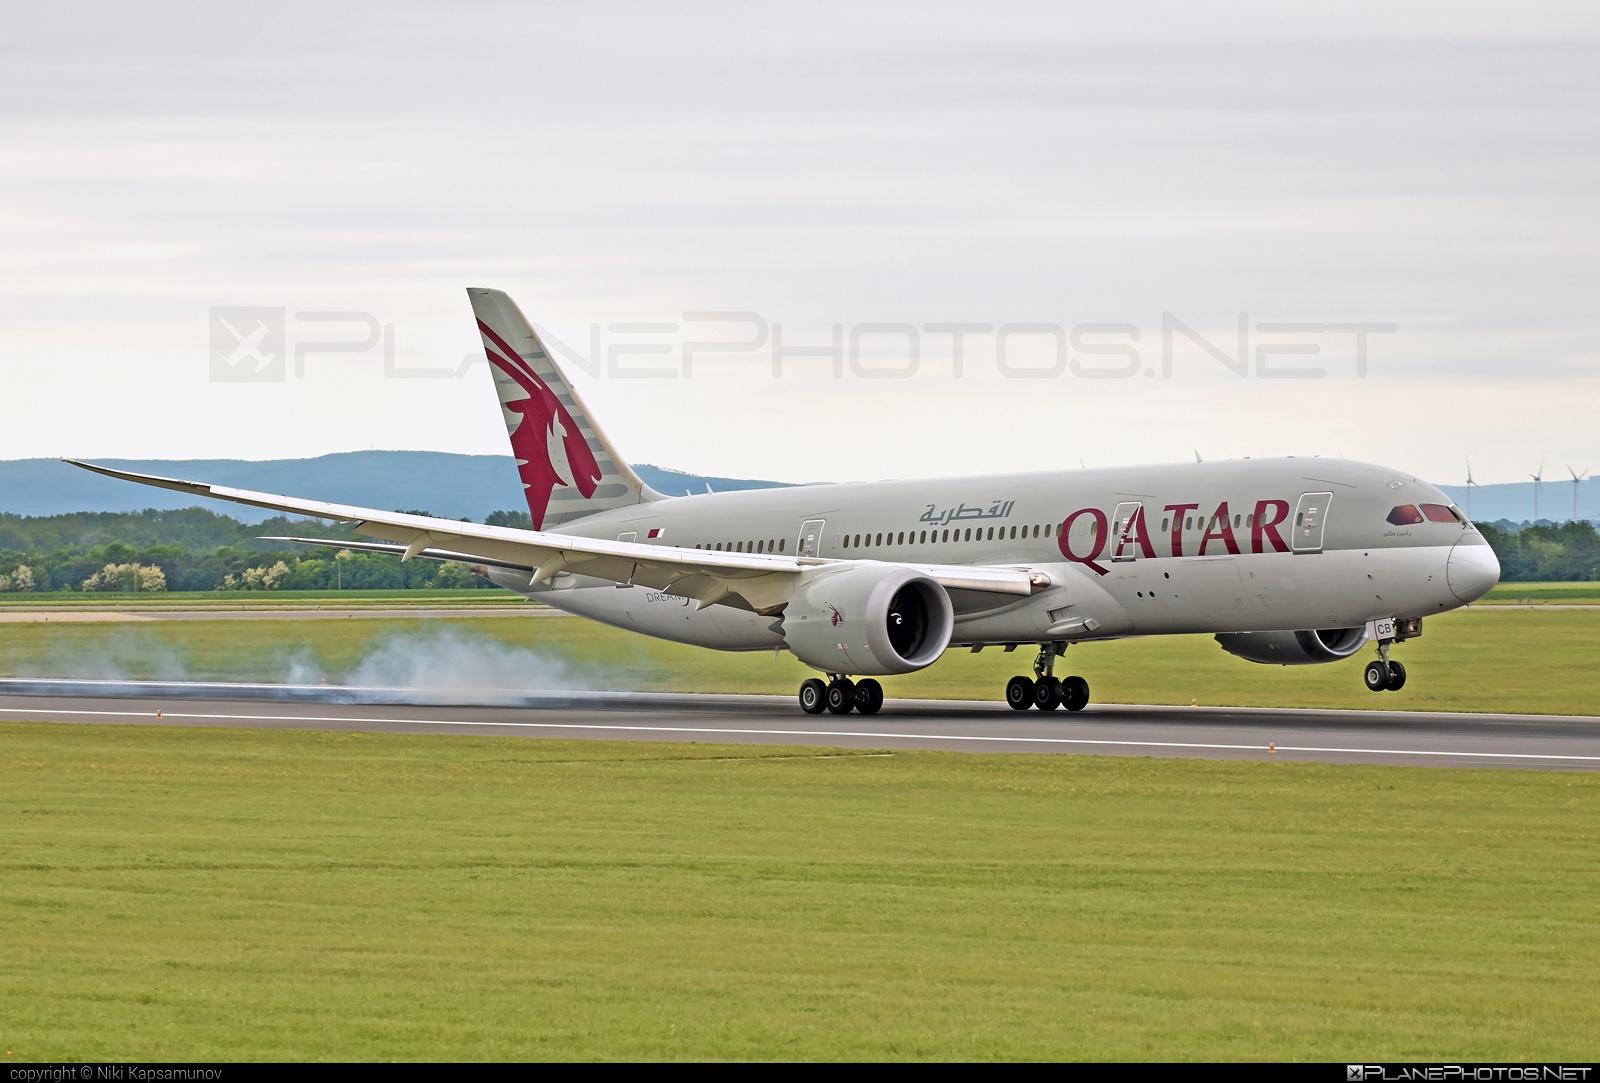 Boeing 787-8 Dreamliner - A7-BCB operated by Qatar Airways #b787 #boeing #boeing787 #dreamliner #qatarairways